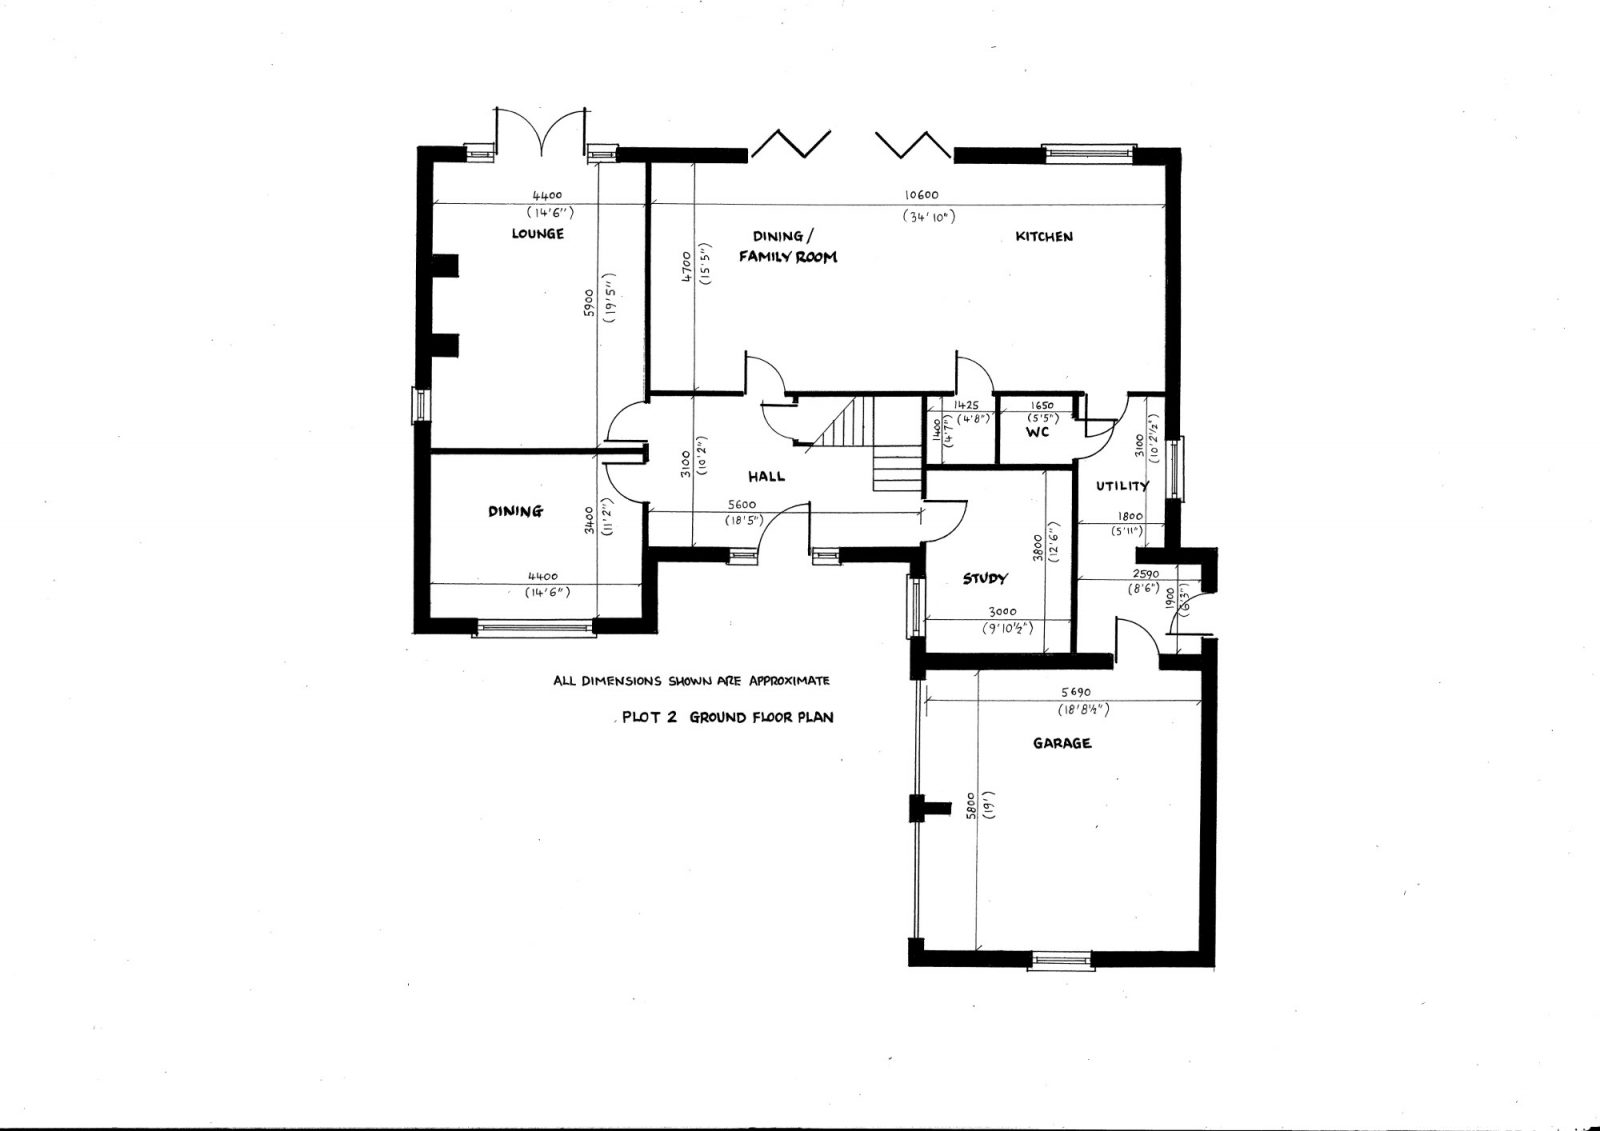 plot 2 side ground floor plan